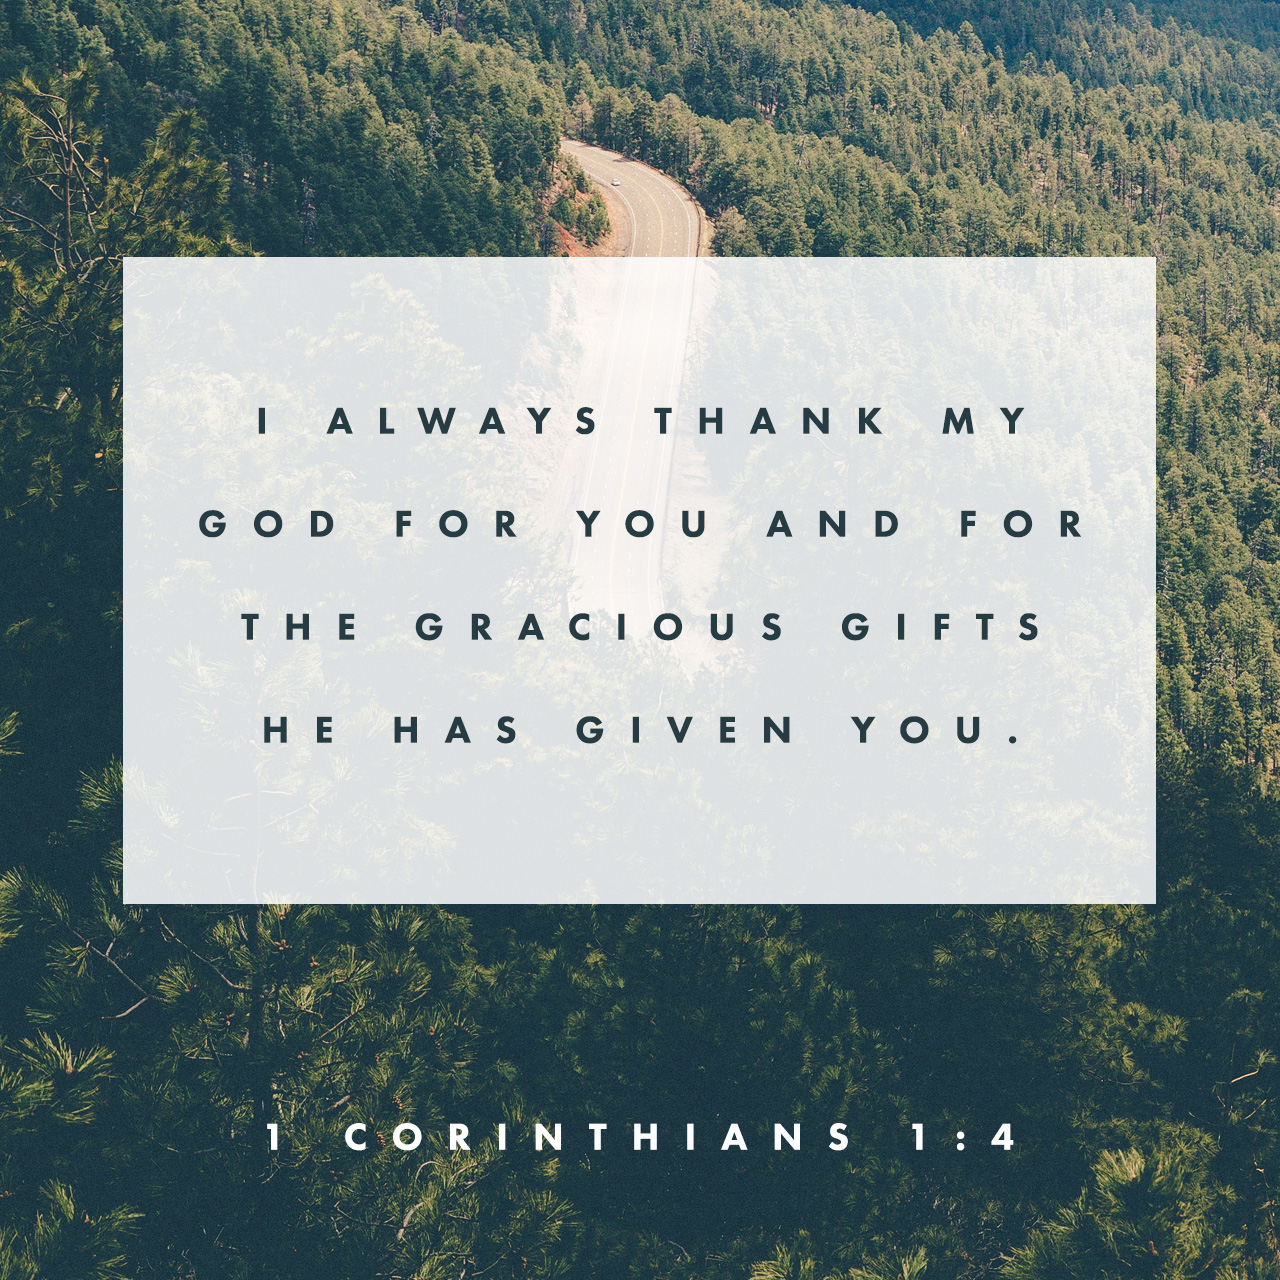 1 Corinthians 1:4